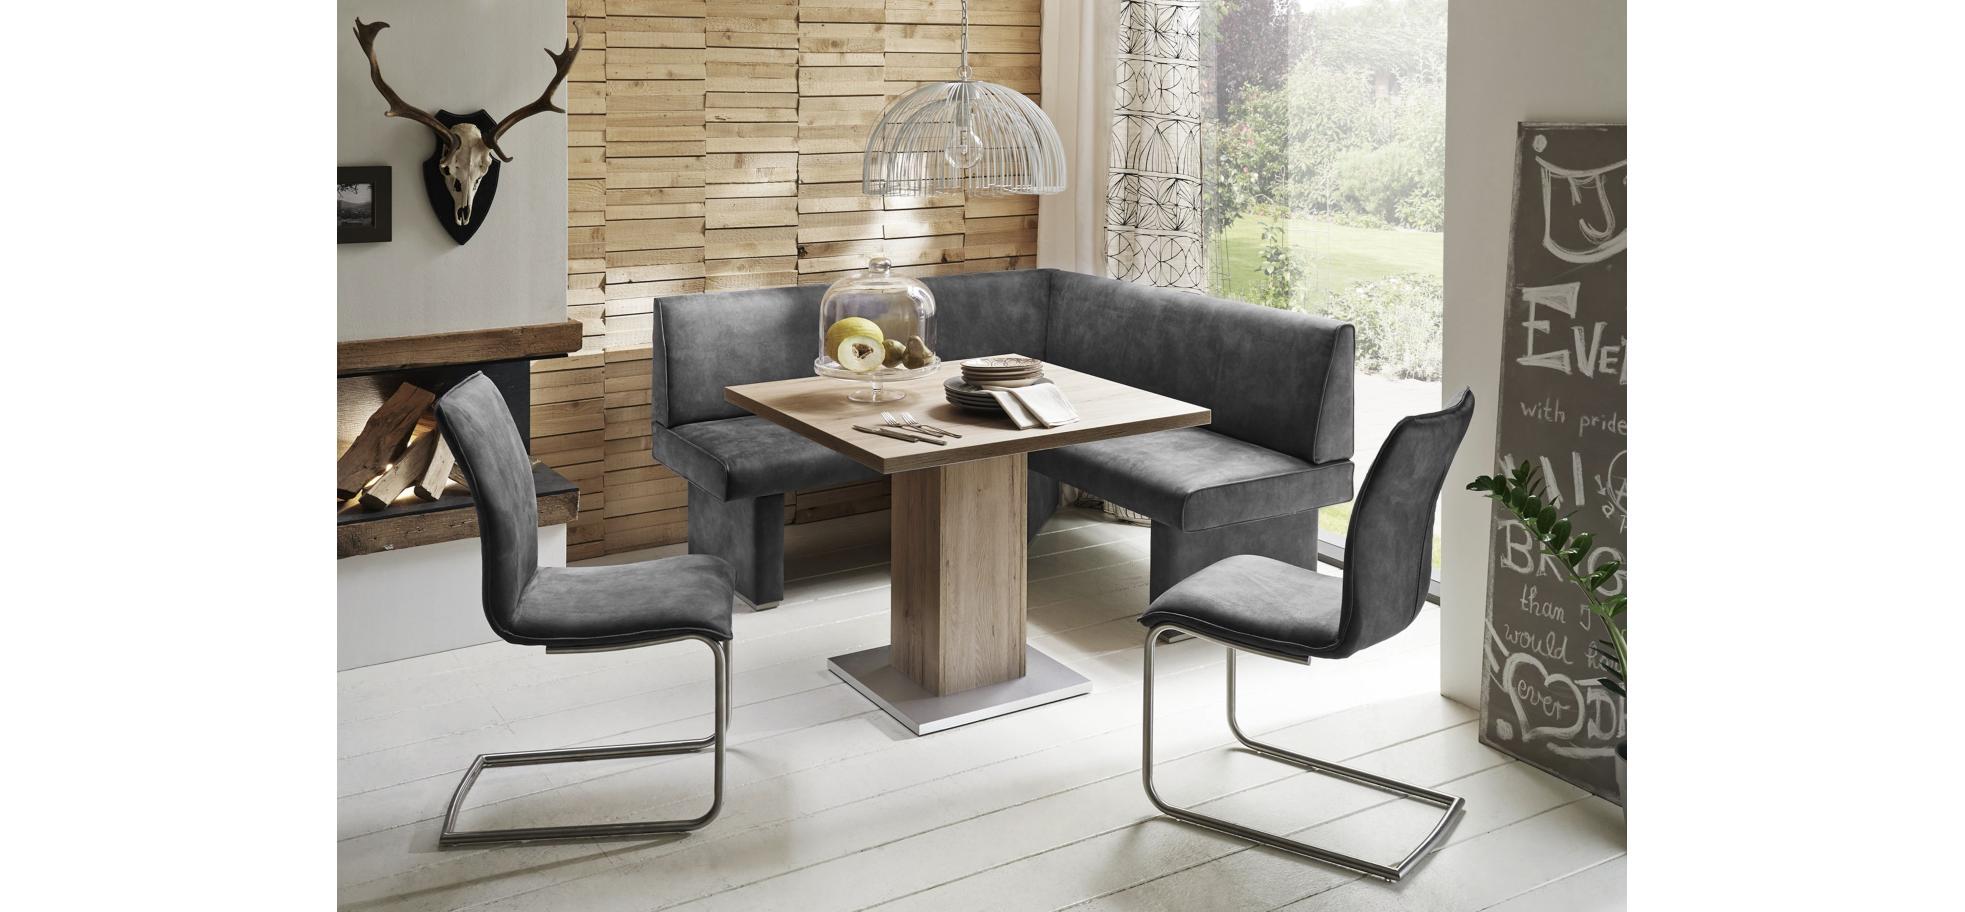 schwingstuhl in graphit m belhaus pohl wilhelmshaven friesland m belhaus pohl gmbh. Black Bedroom Furniture Sets. Home Design Ideas